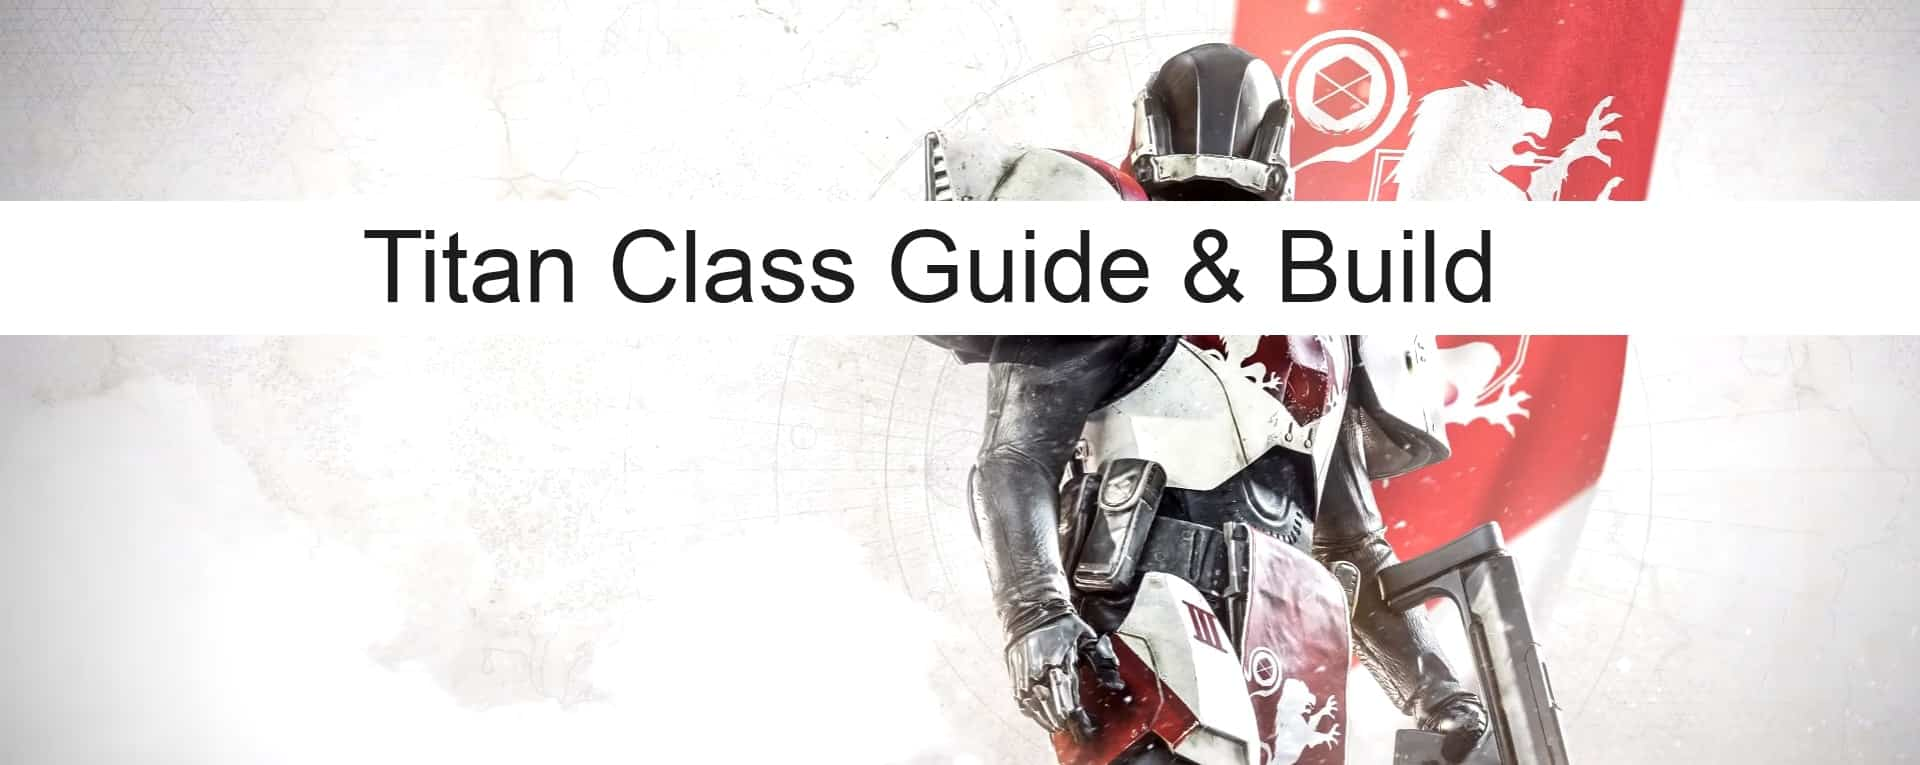 Titan Class guide & build - Destiny 2 Raid Boost & Power Leveling